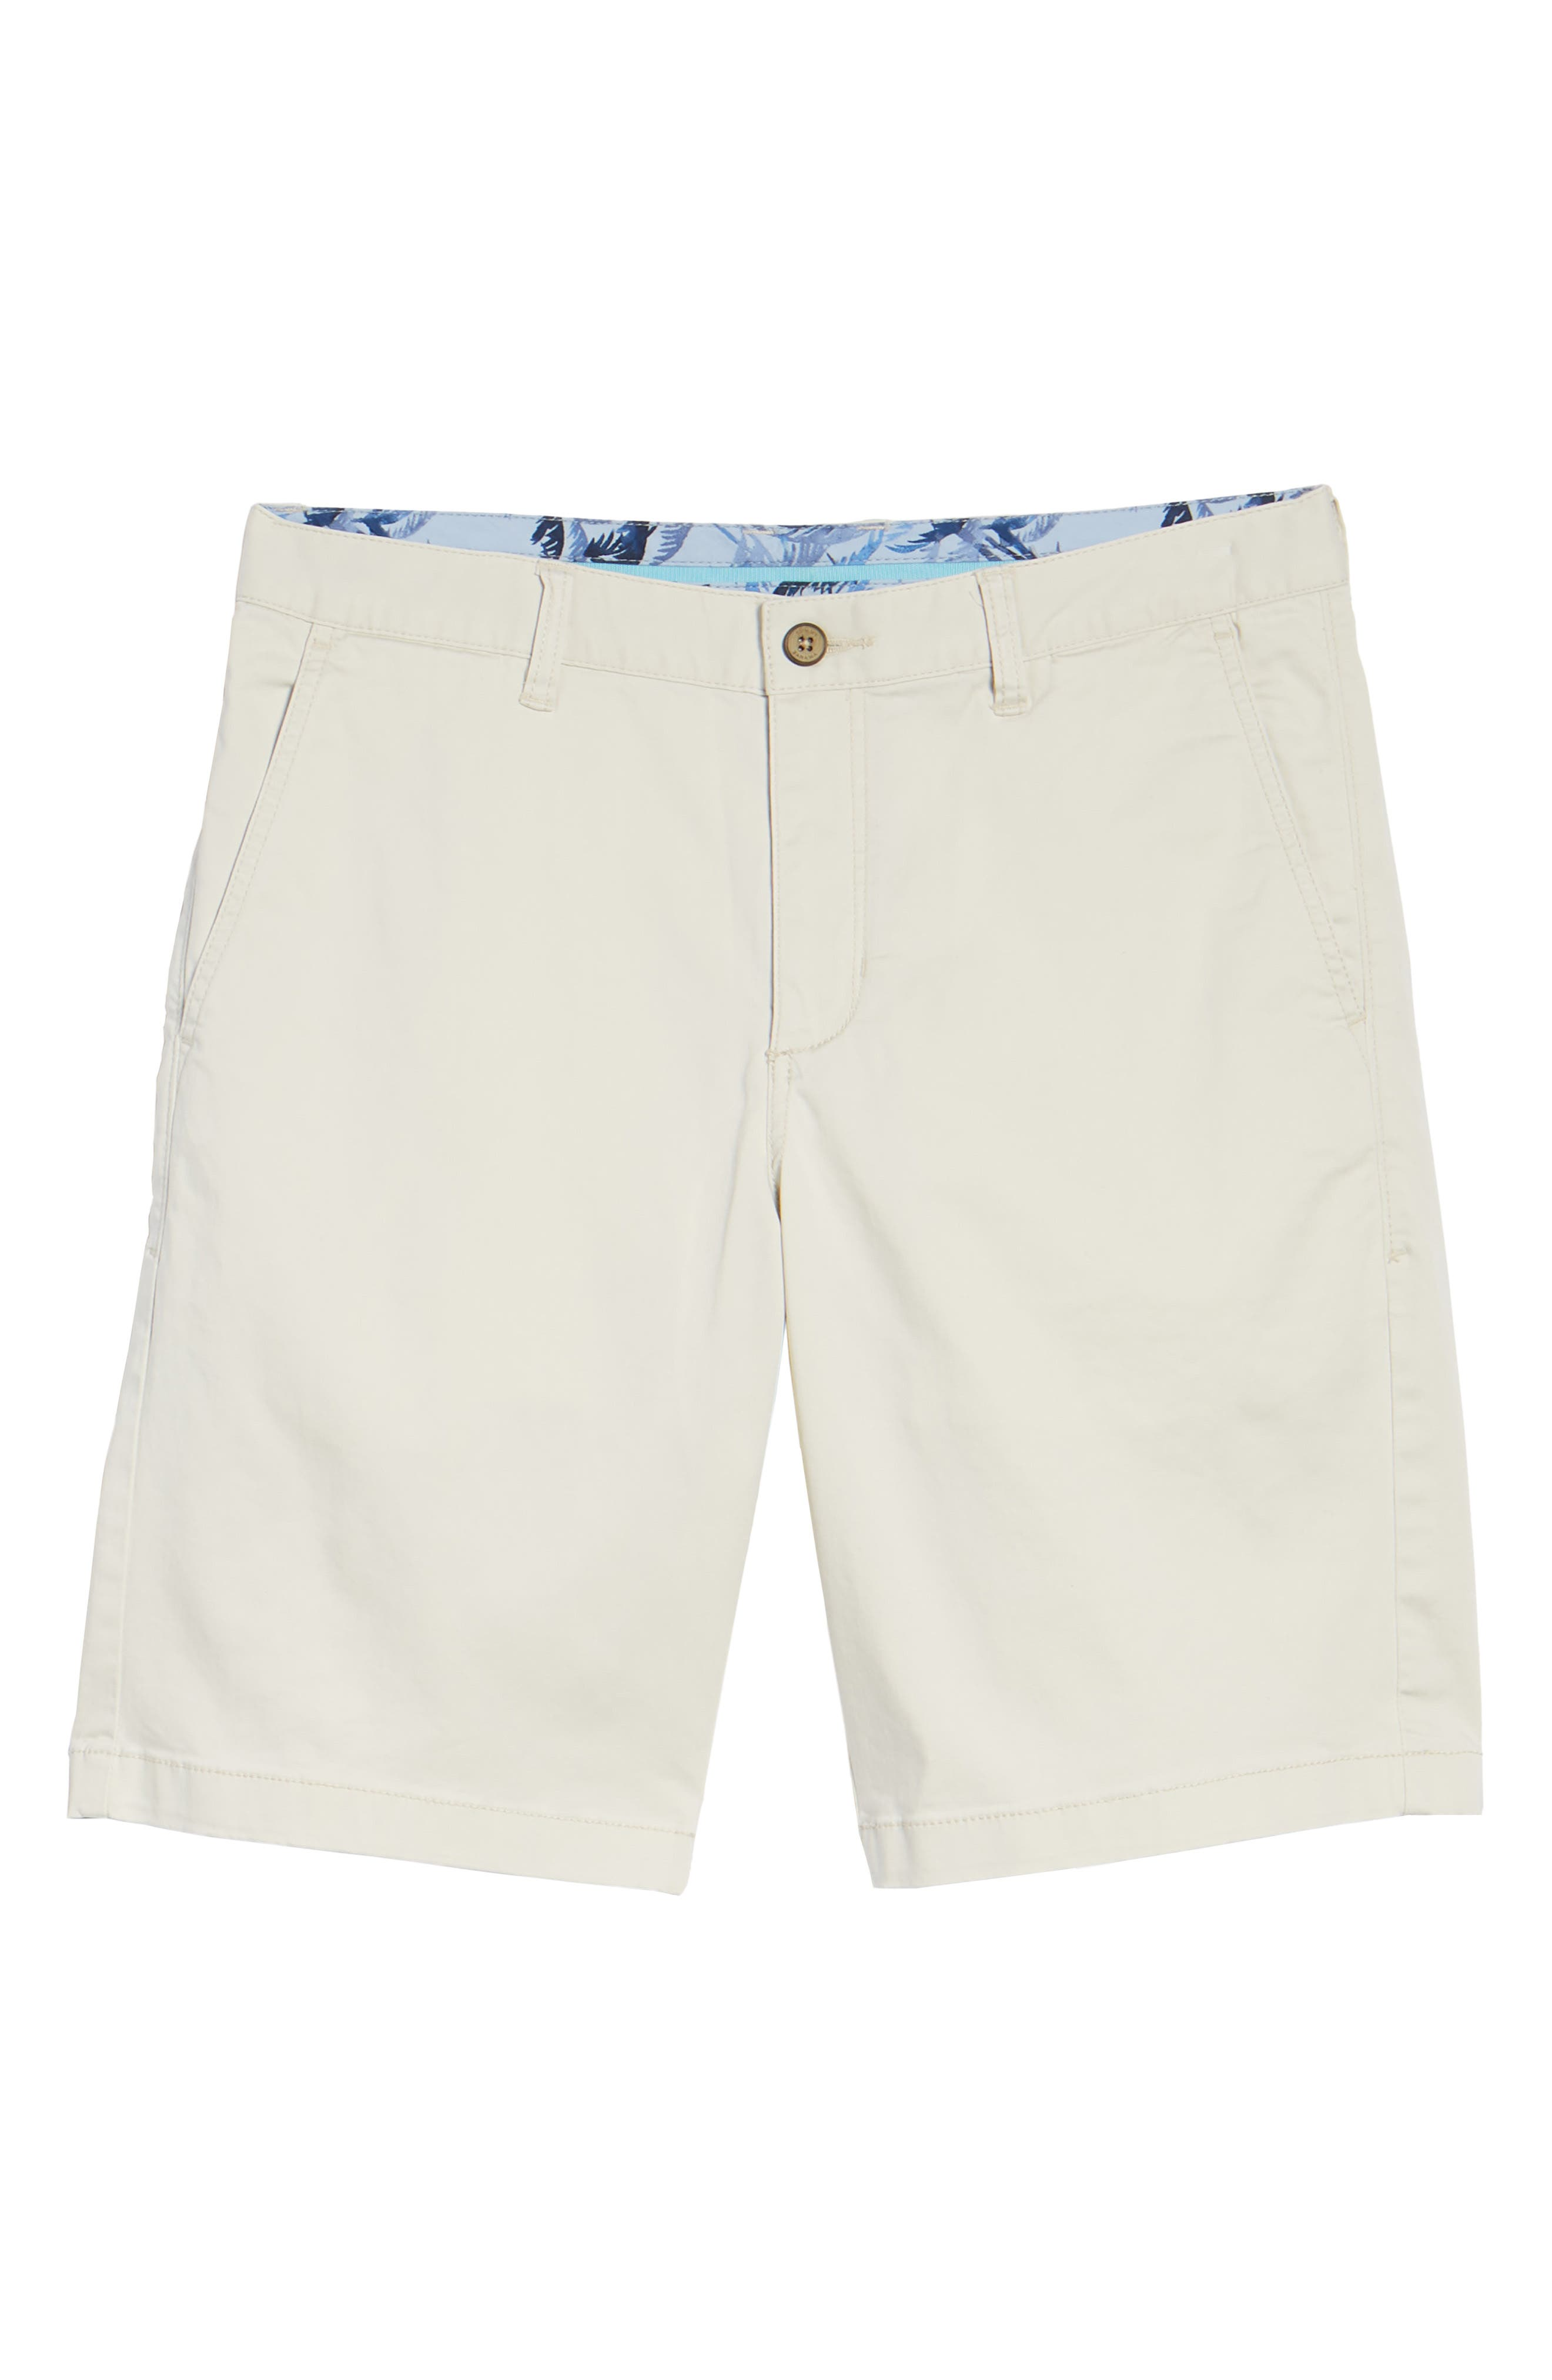 Boracay Chino Shorts,                             Alternate thumbnail 44, color,